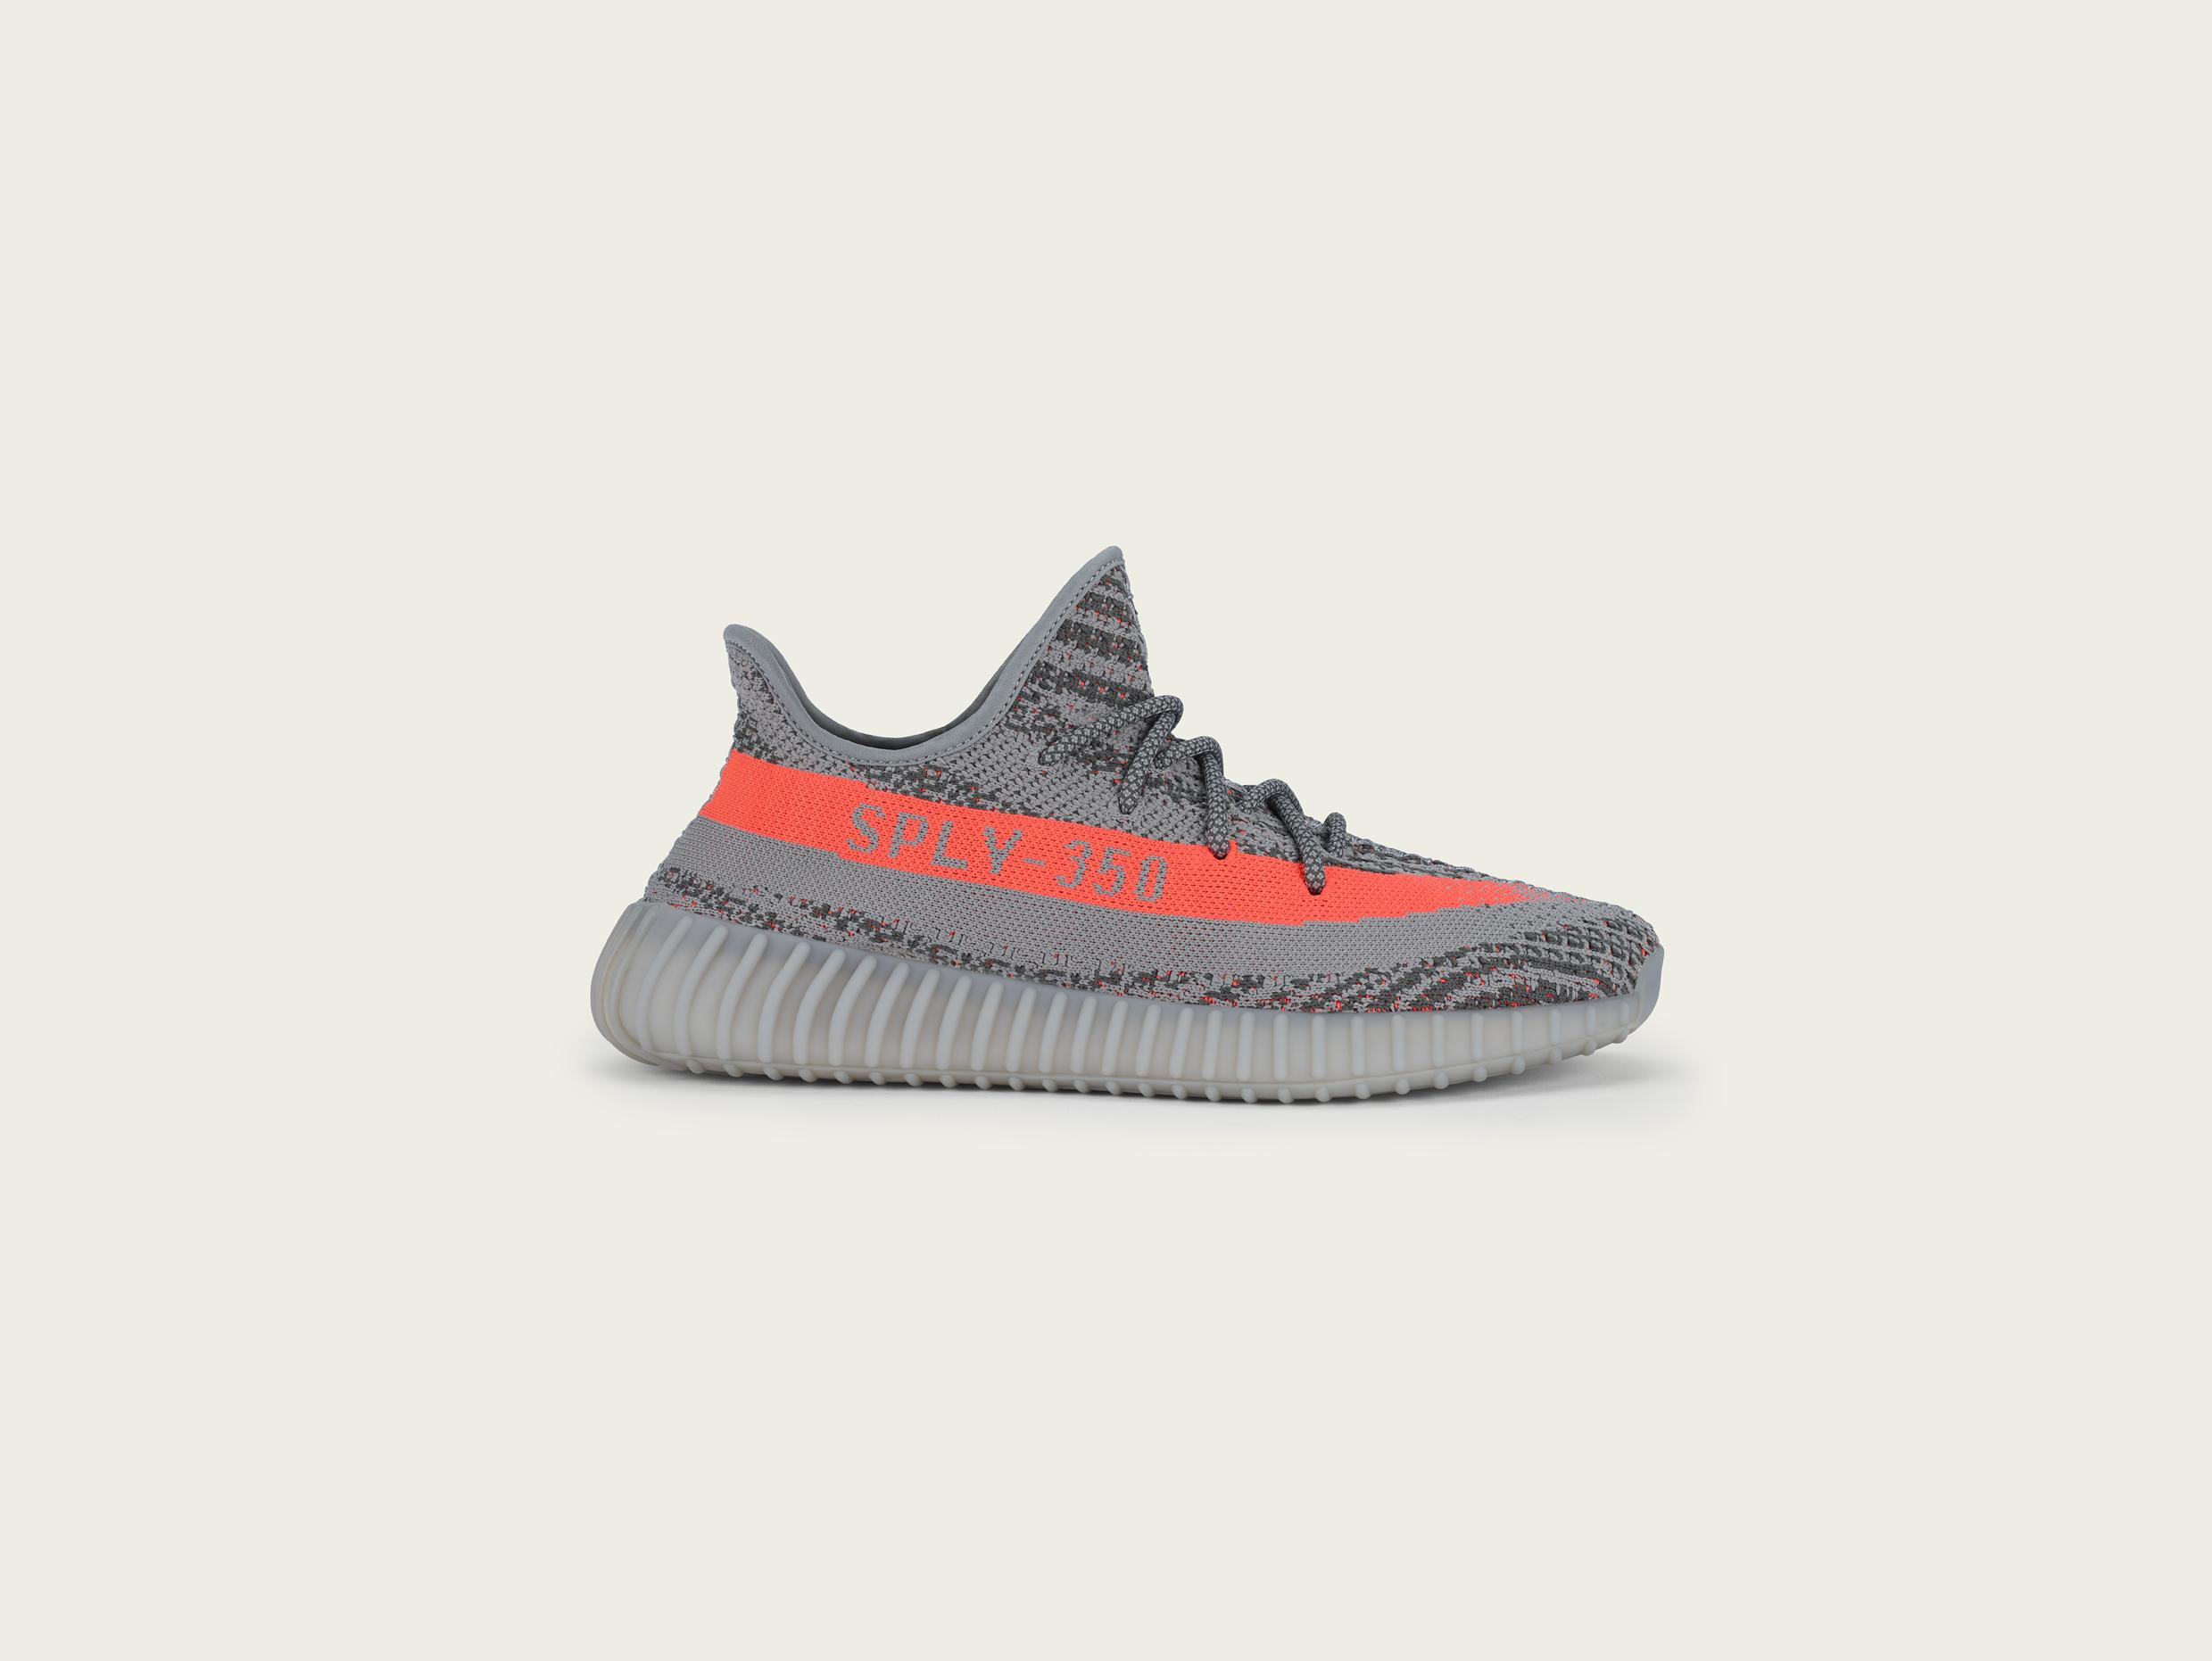 adidas originals x kanye west yeezy boost 350 v2